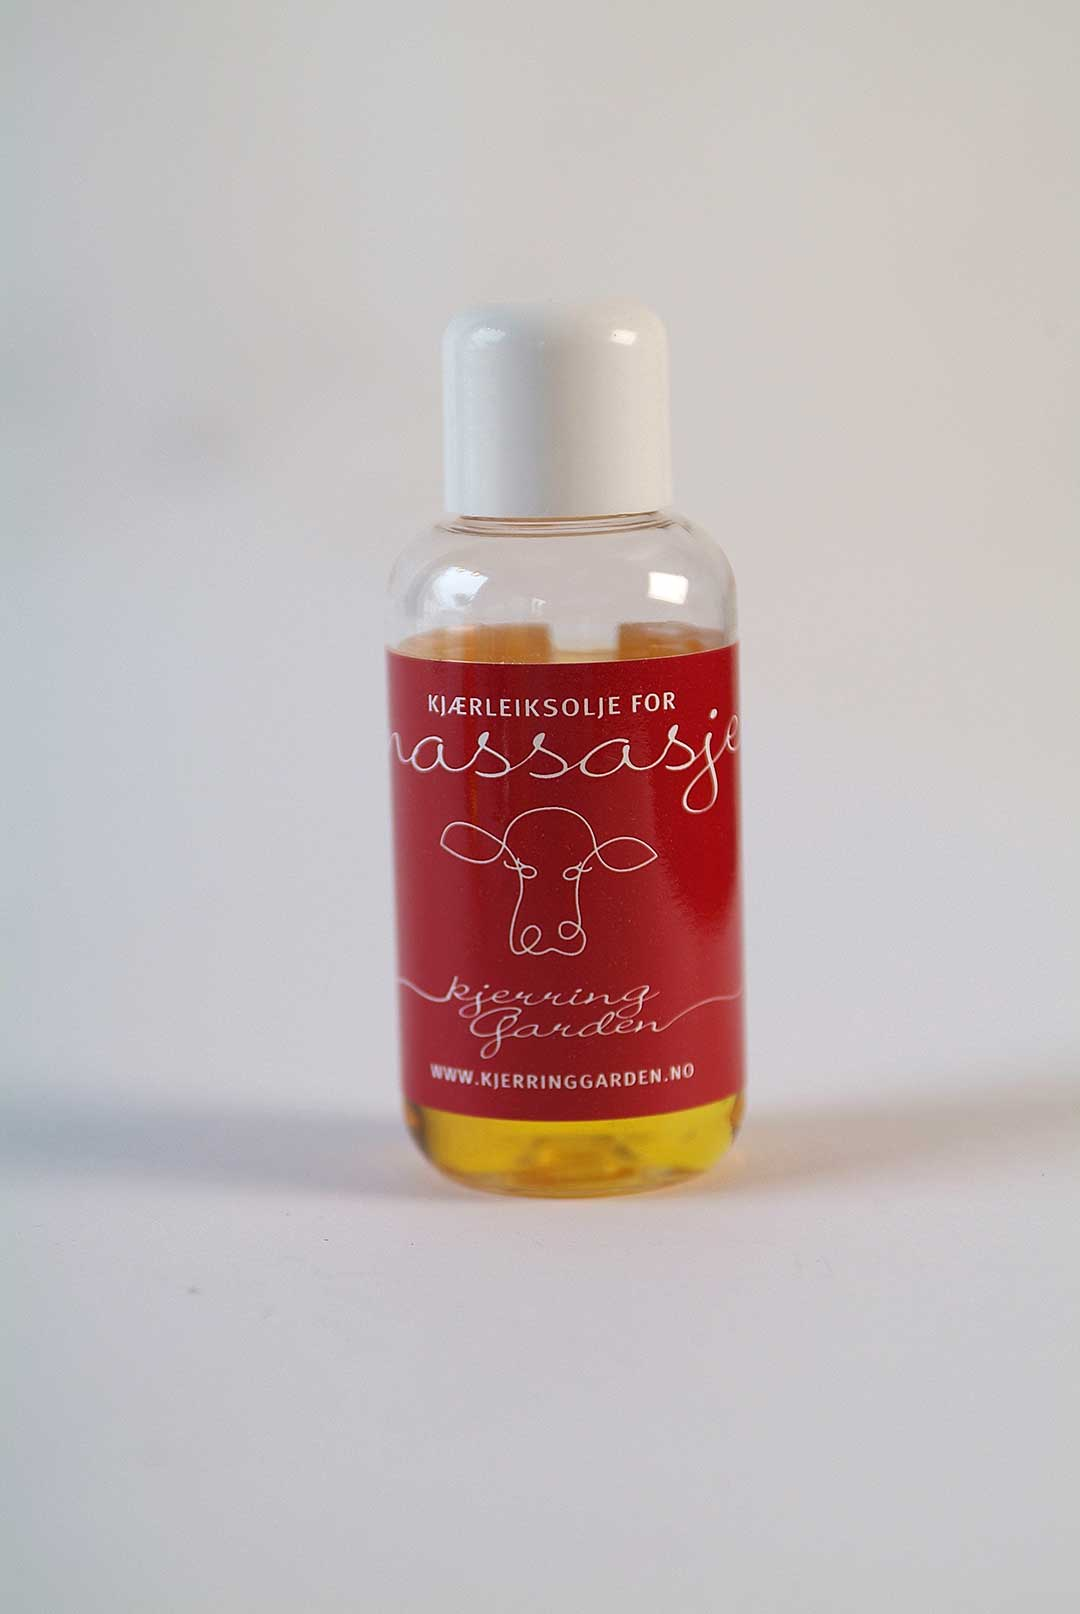 Kjærleiks olje for massasje